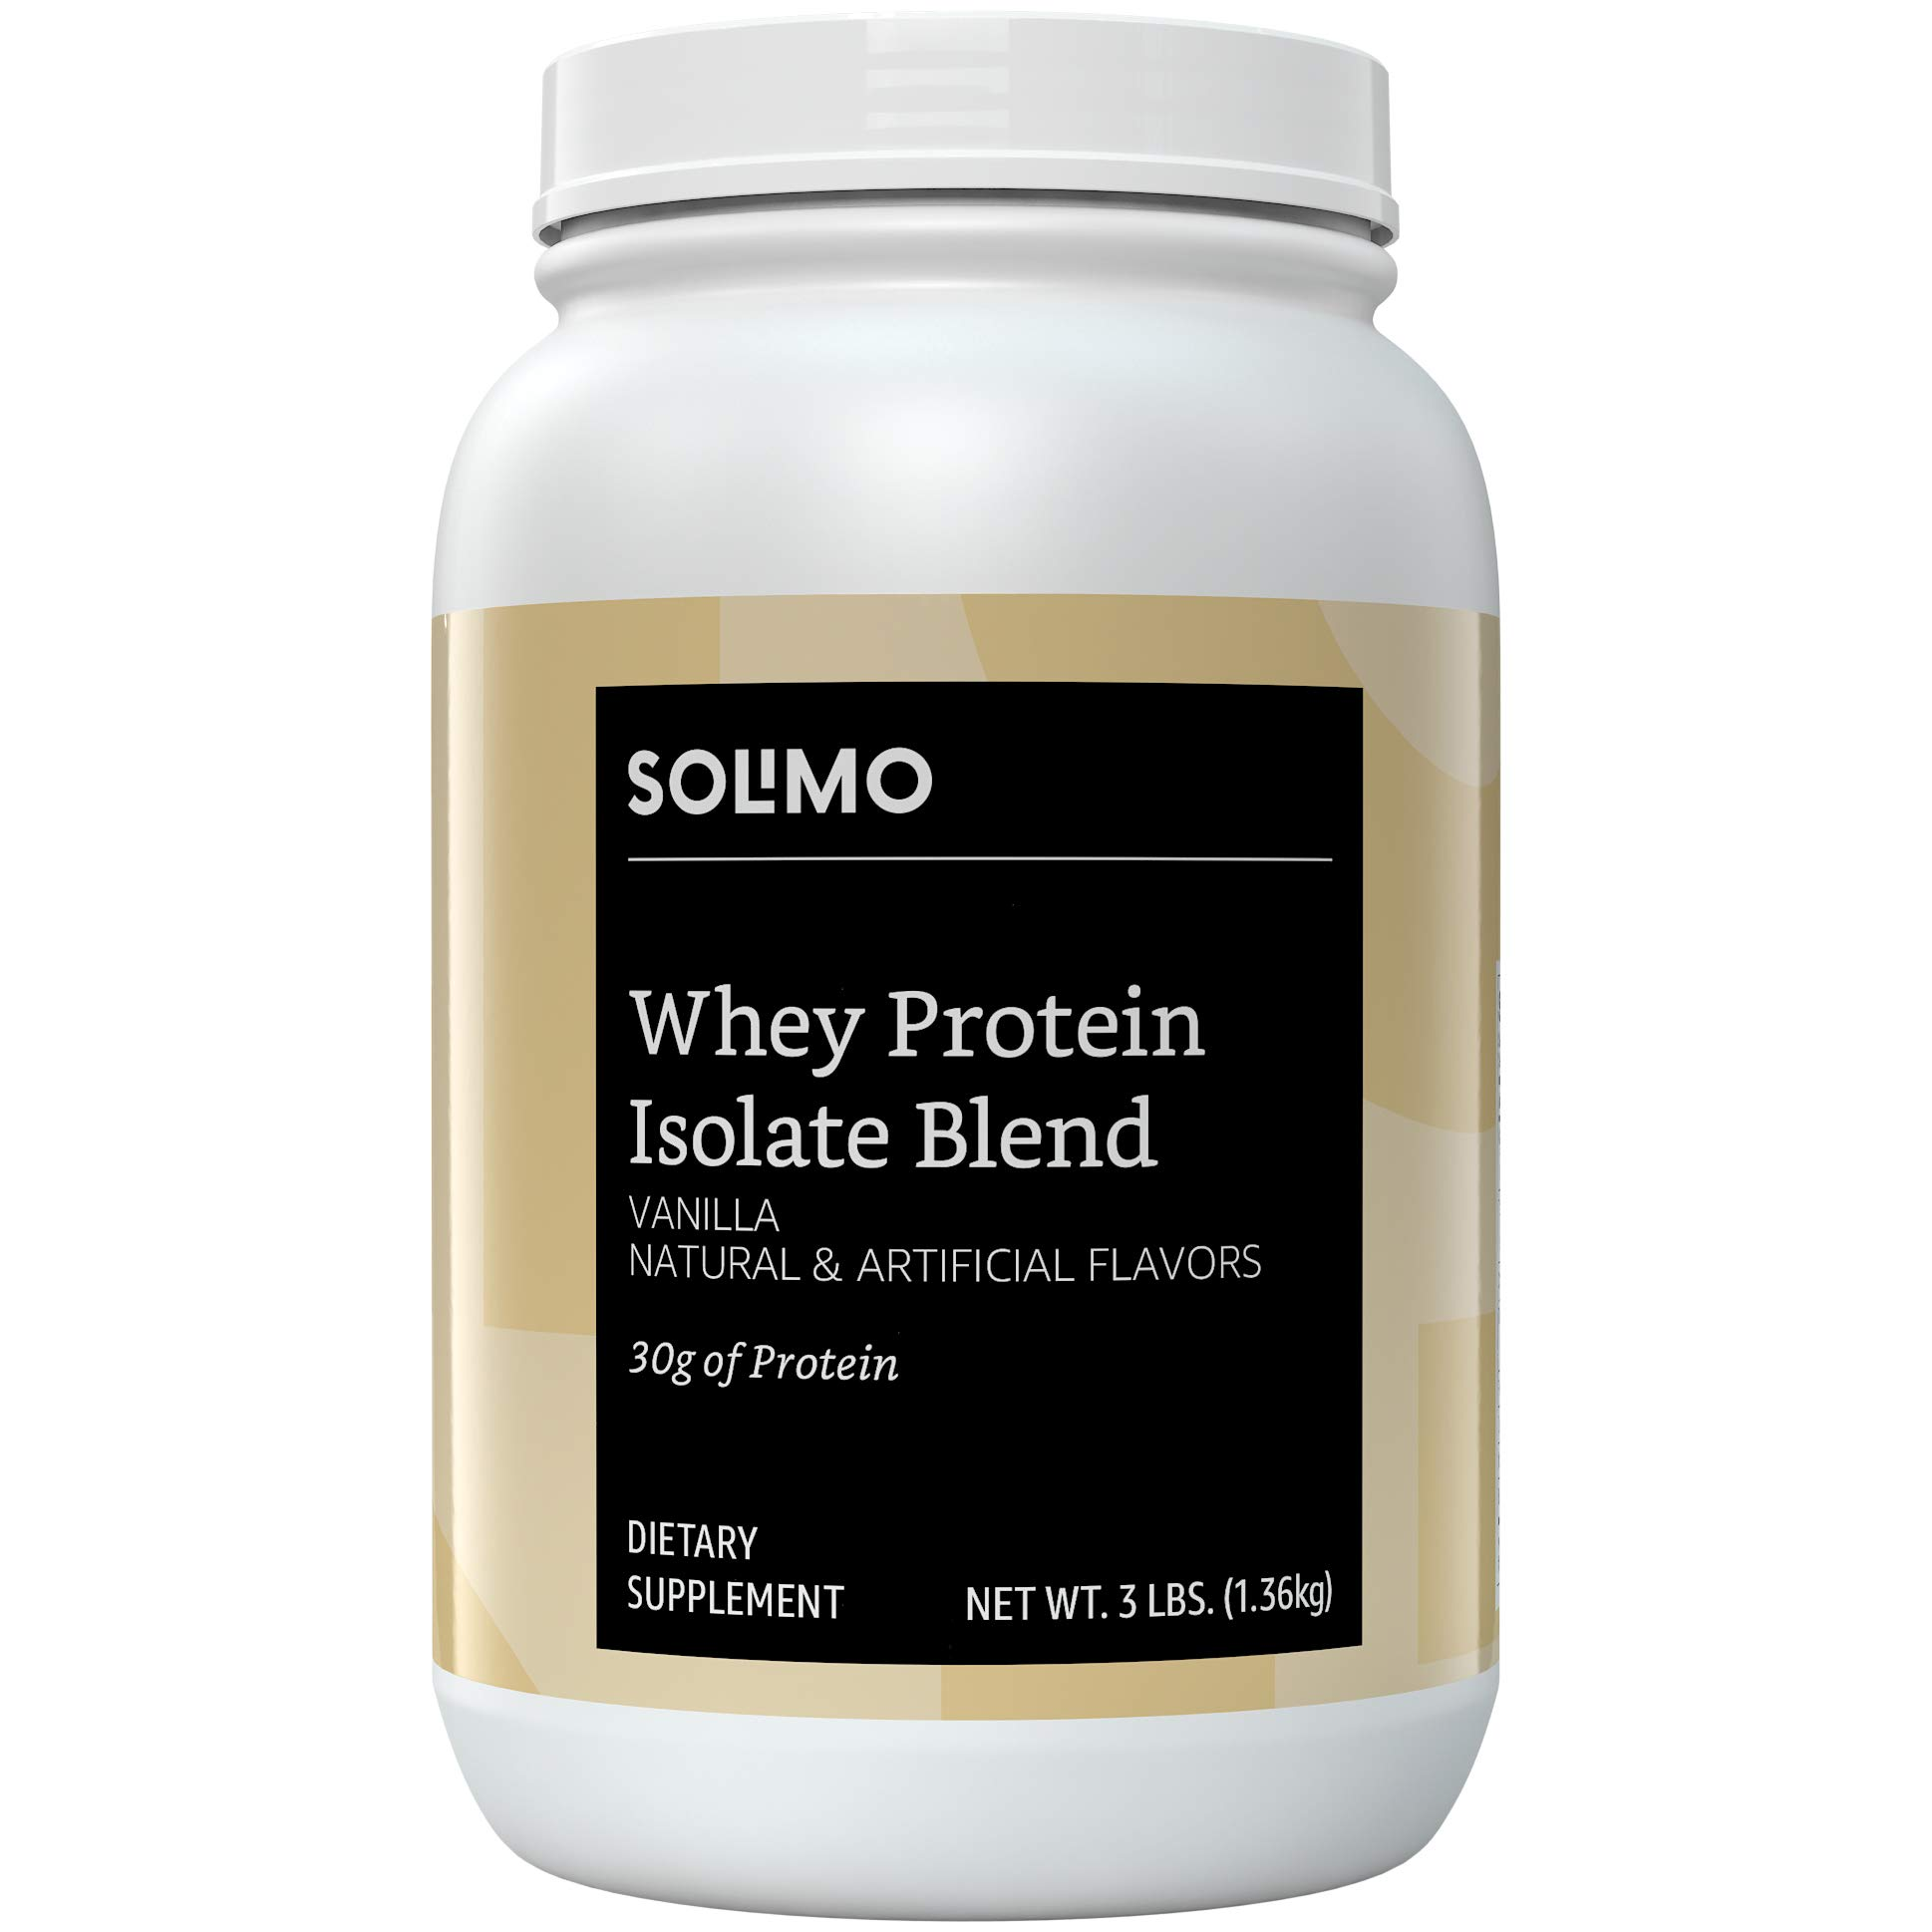 Amazon Brand - Solimo Whey Protein Isolate Blend, Vanilla, 3 Pound (35 Servings)